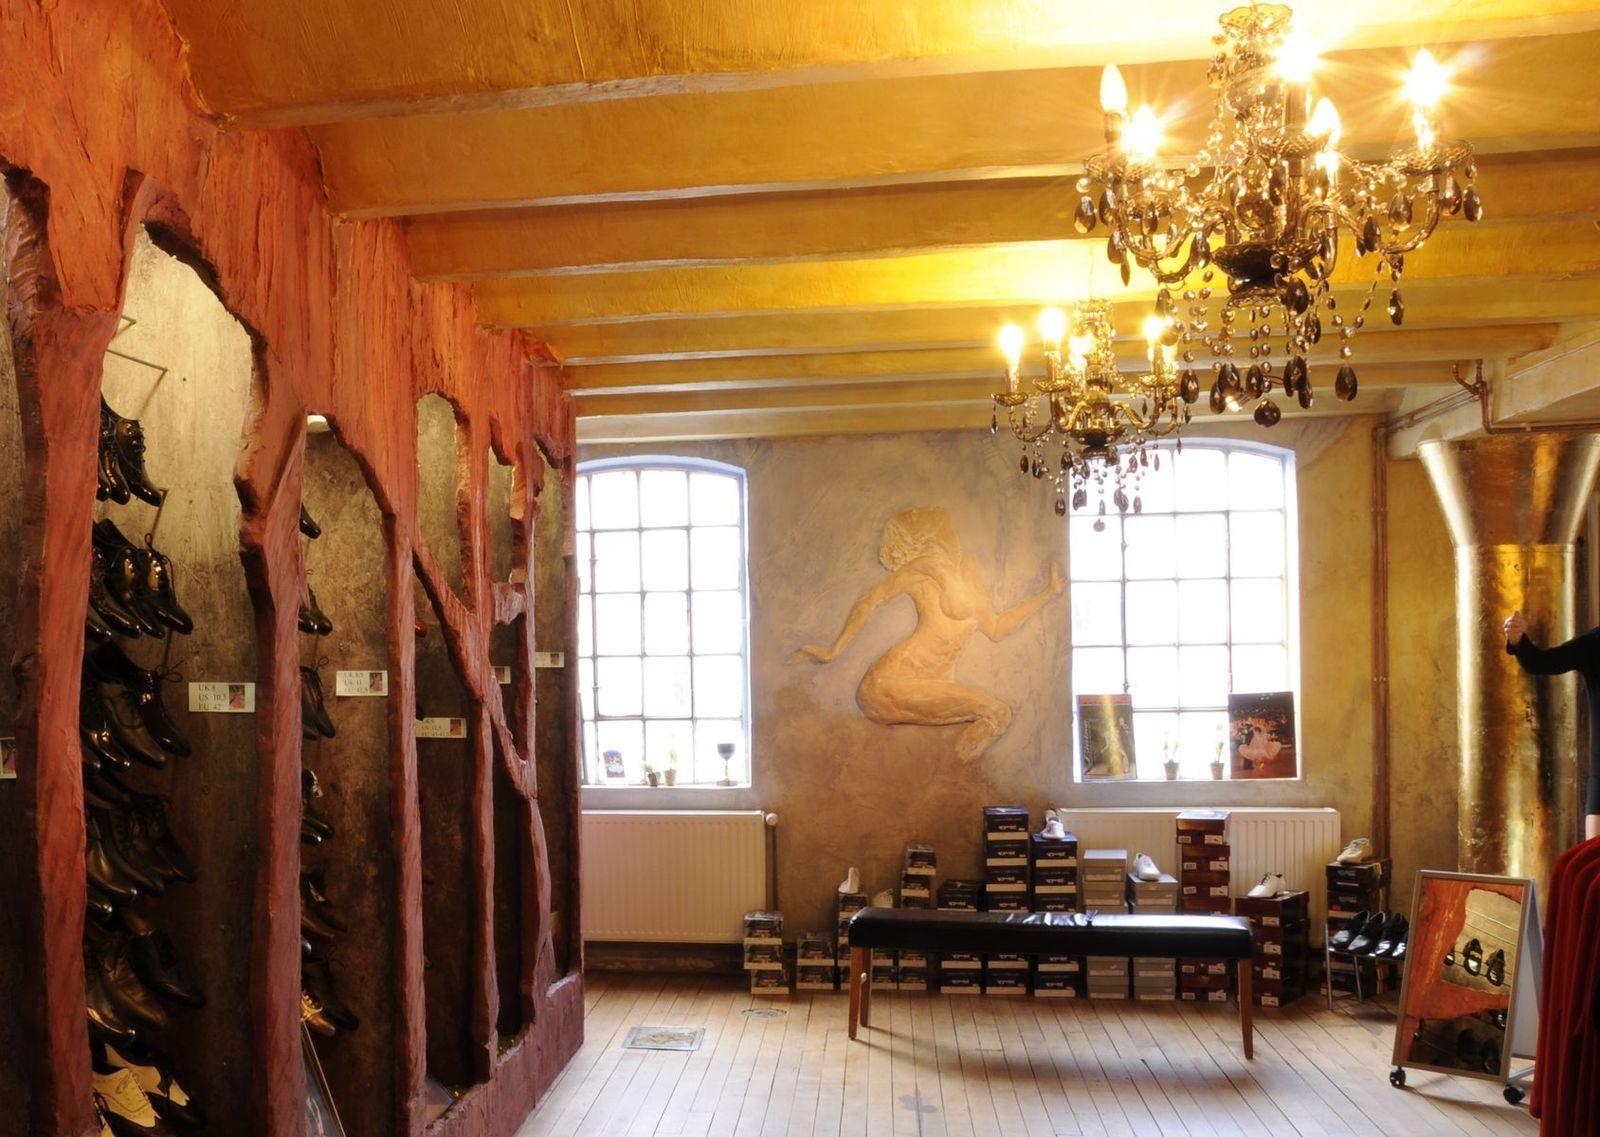 Dekorative Relief - Schuhhoehlen - Saeulenbeschichtung